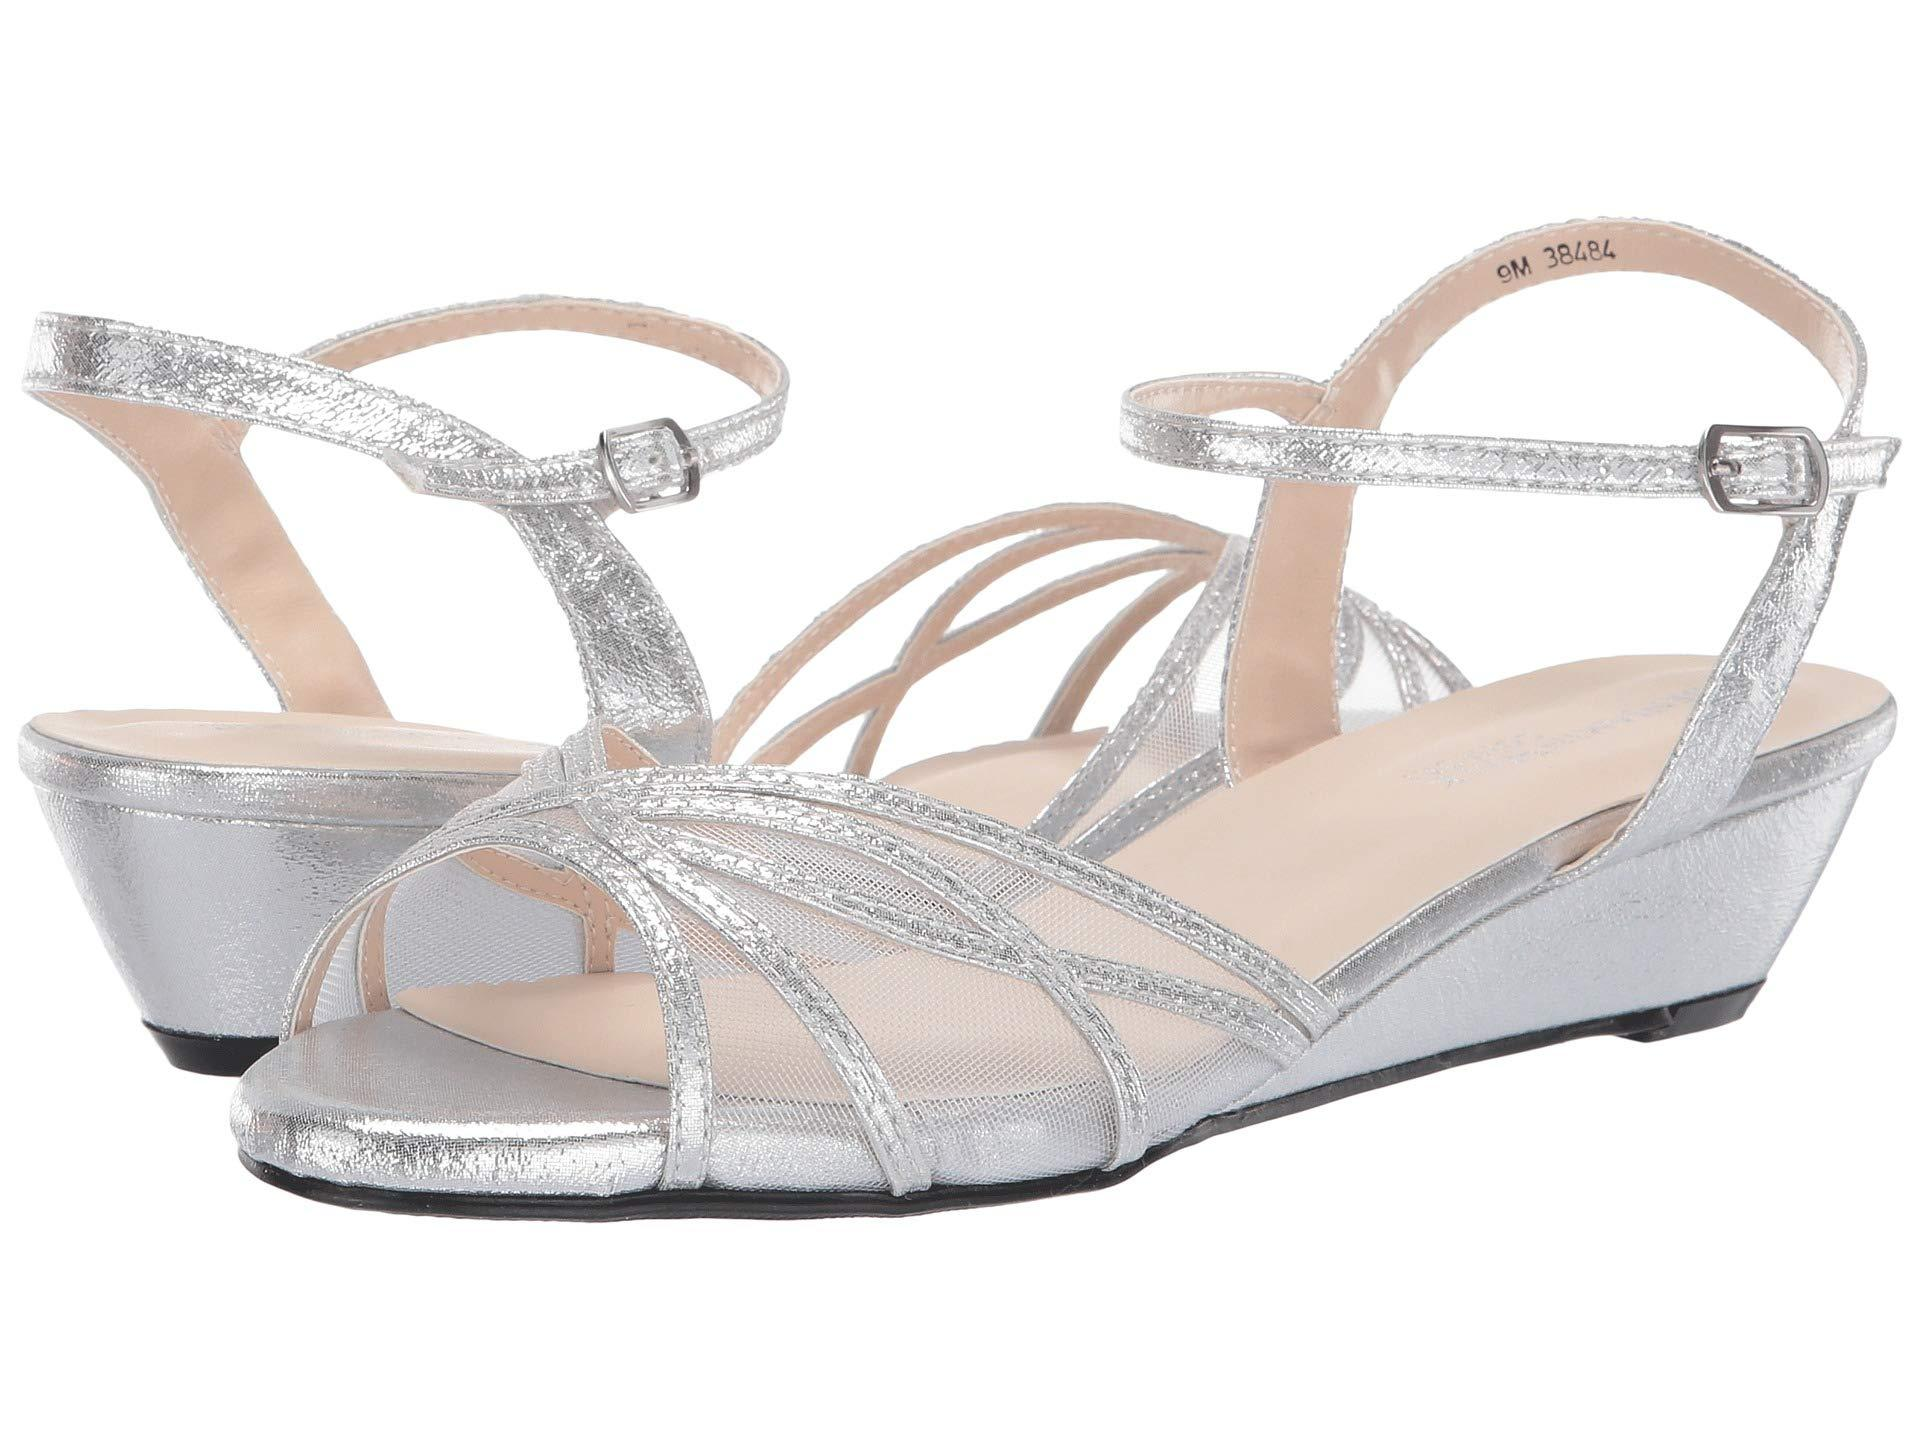 2c33f2e28c5704 Lyst - Touch Ups Desi (nude) Women s Shoes in Metallic